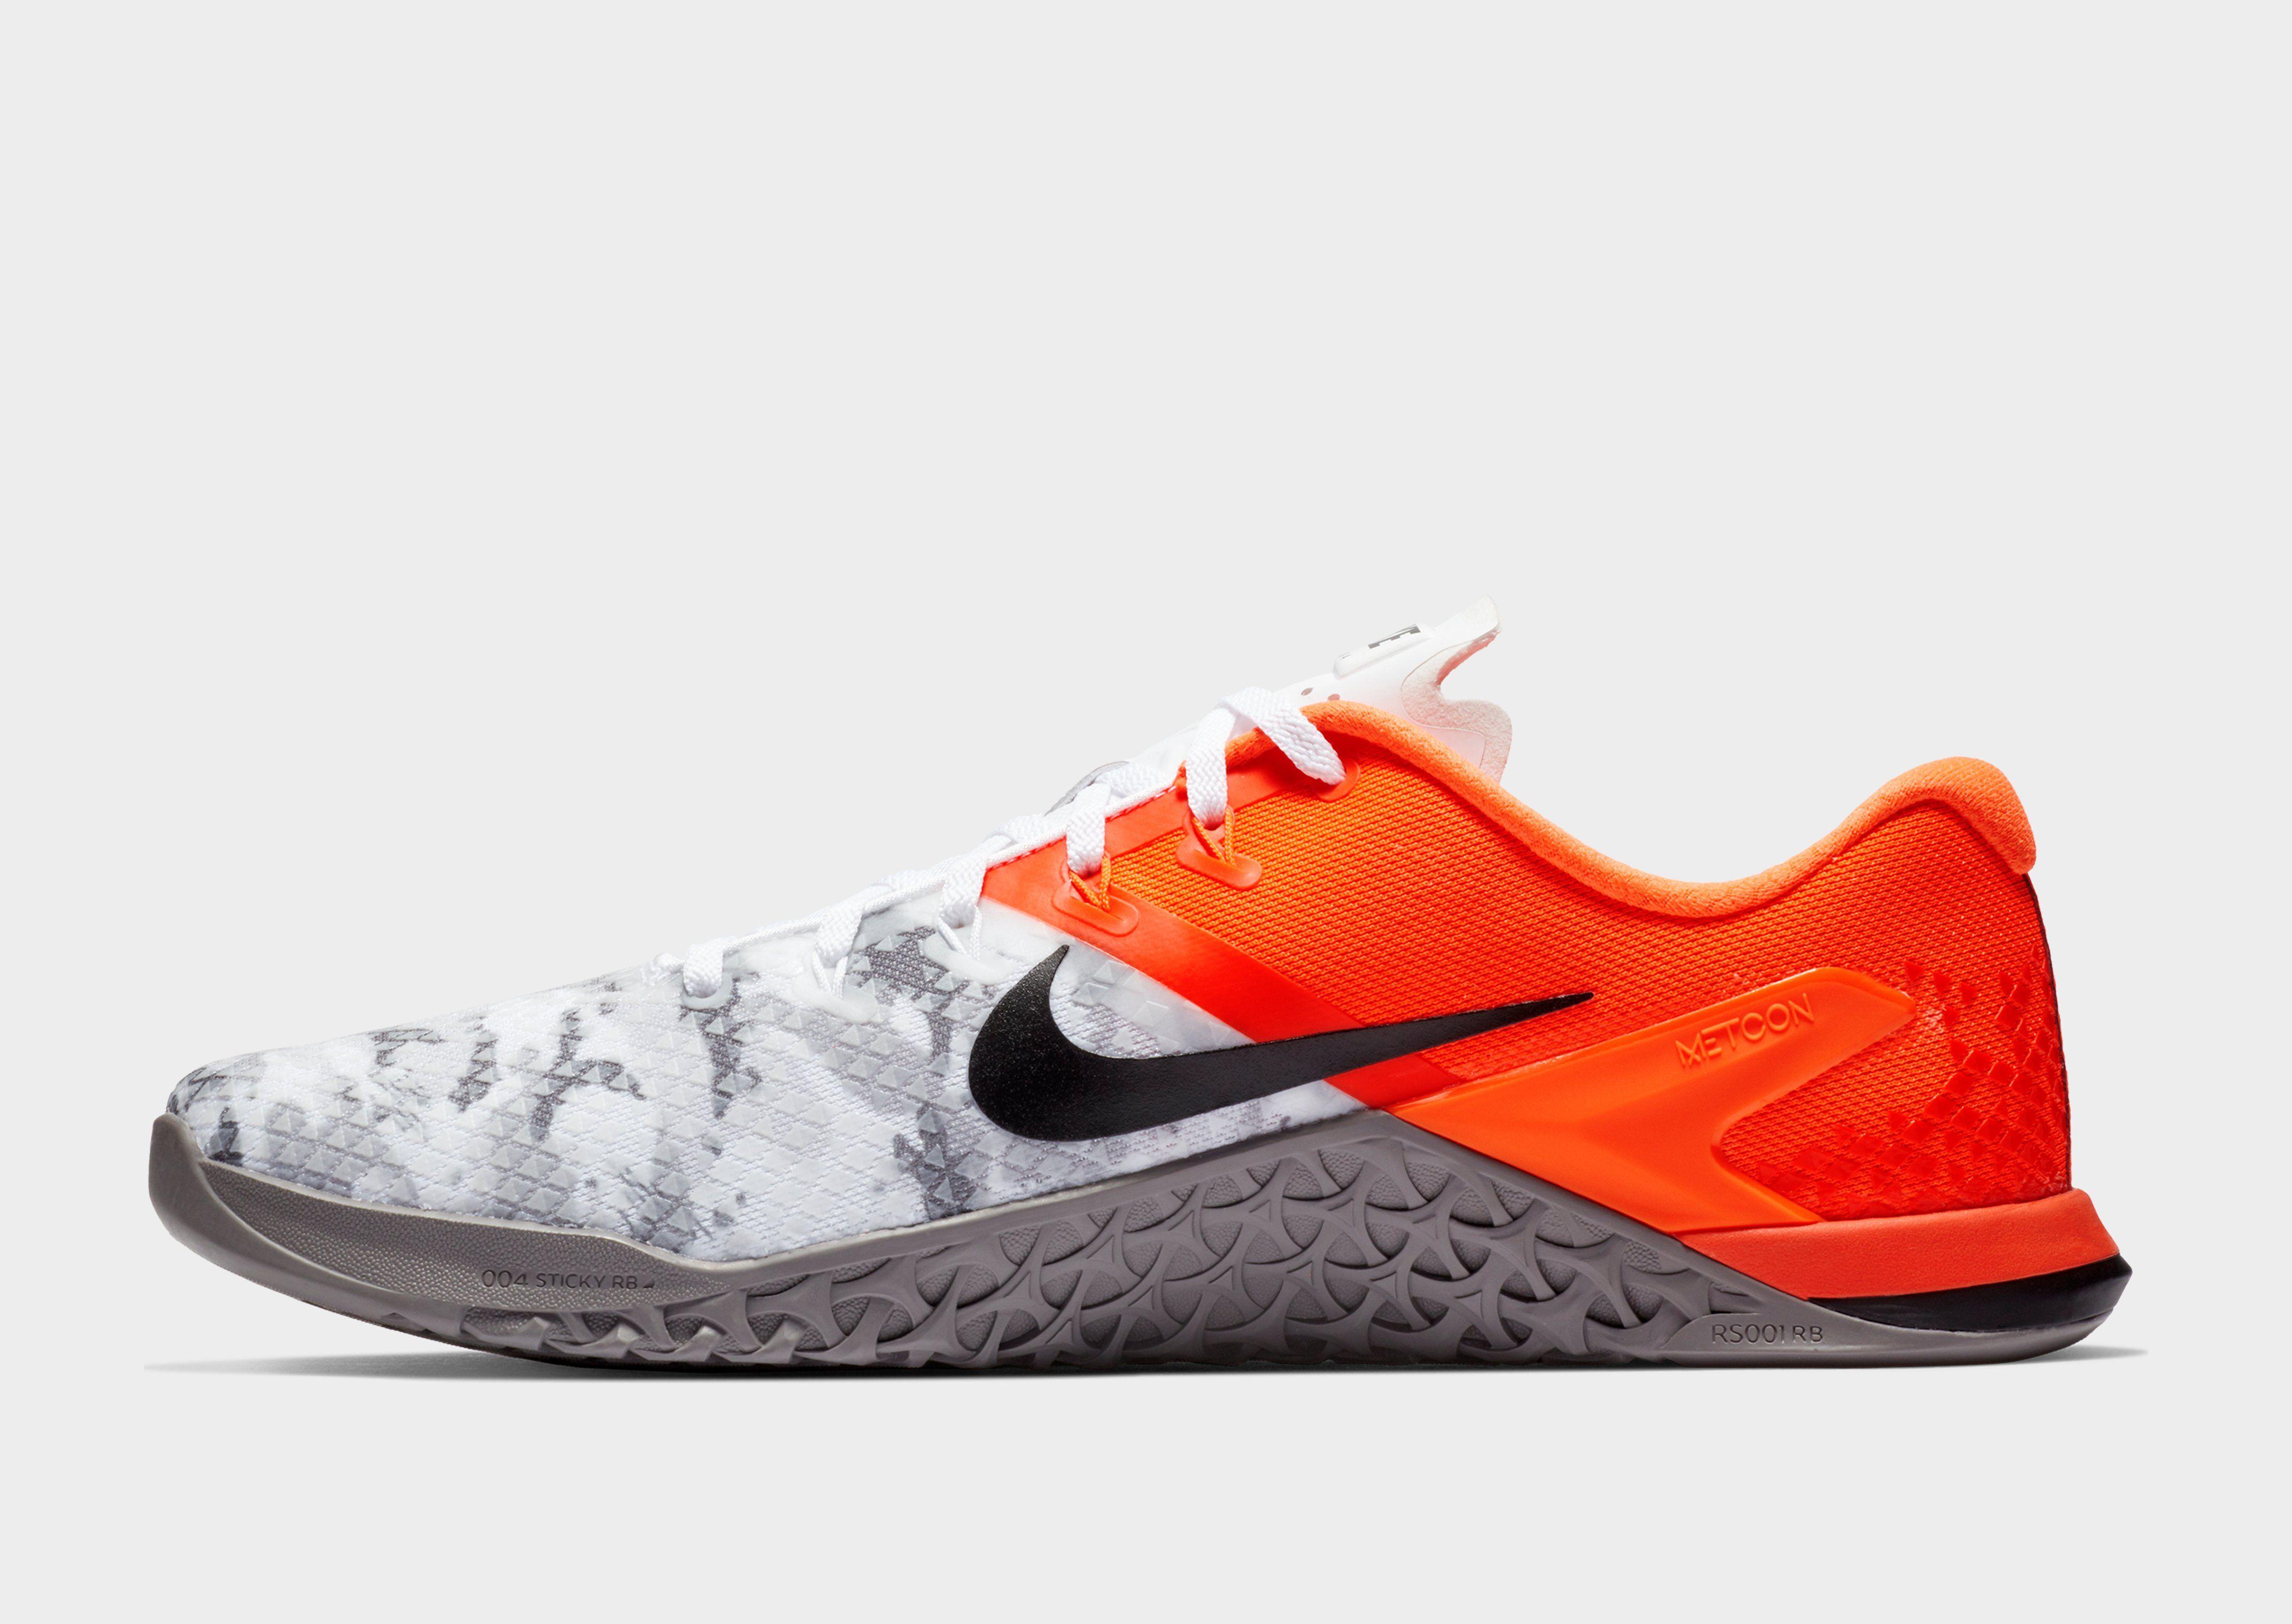 separation shoes ce49e bd3a1 NIKE Nike Metcon 4 XD Men s Training Shoe   JD Sports